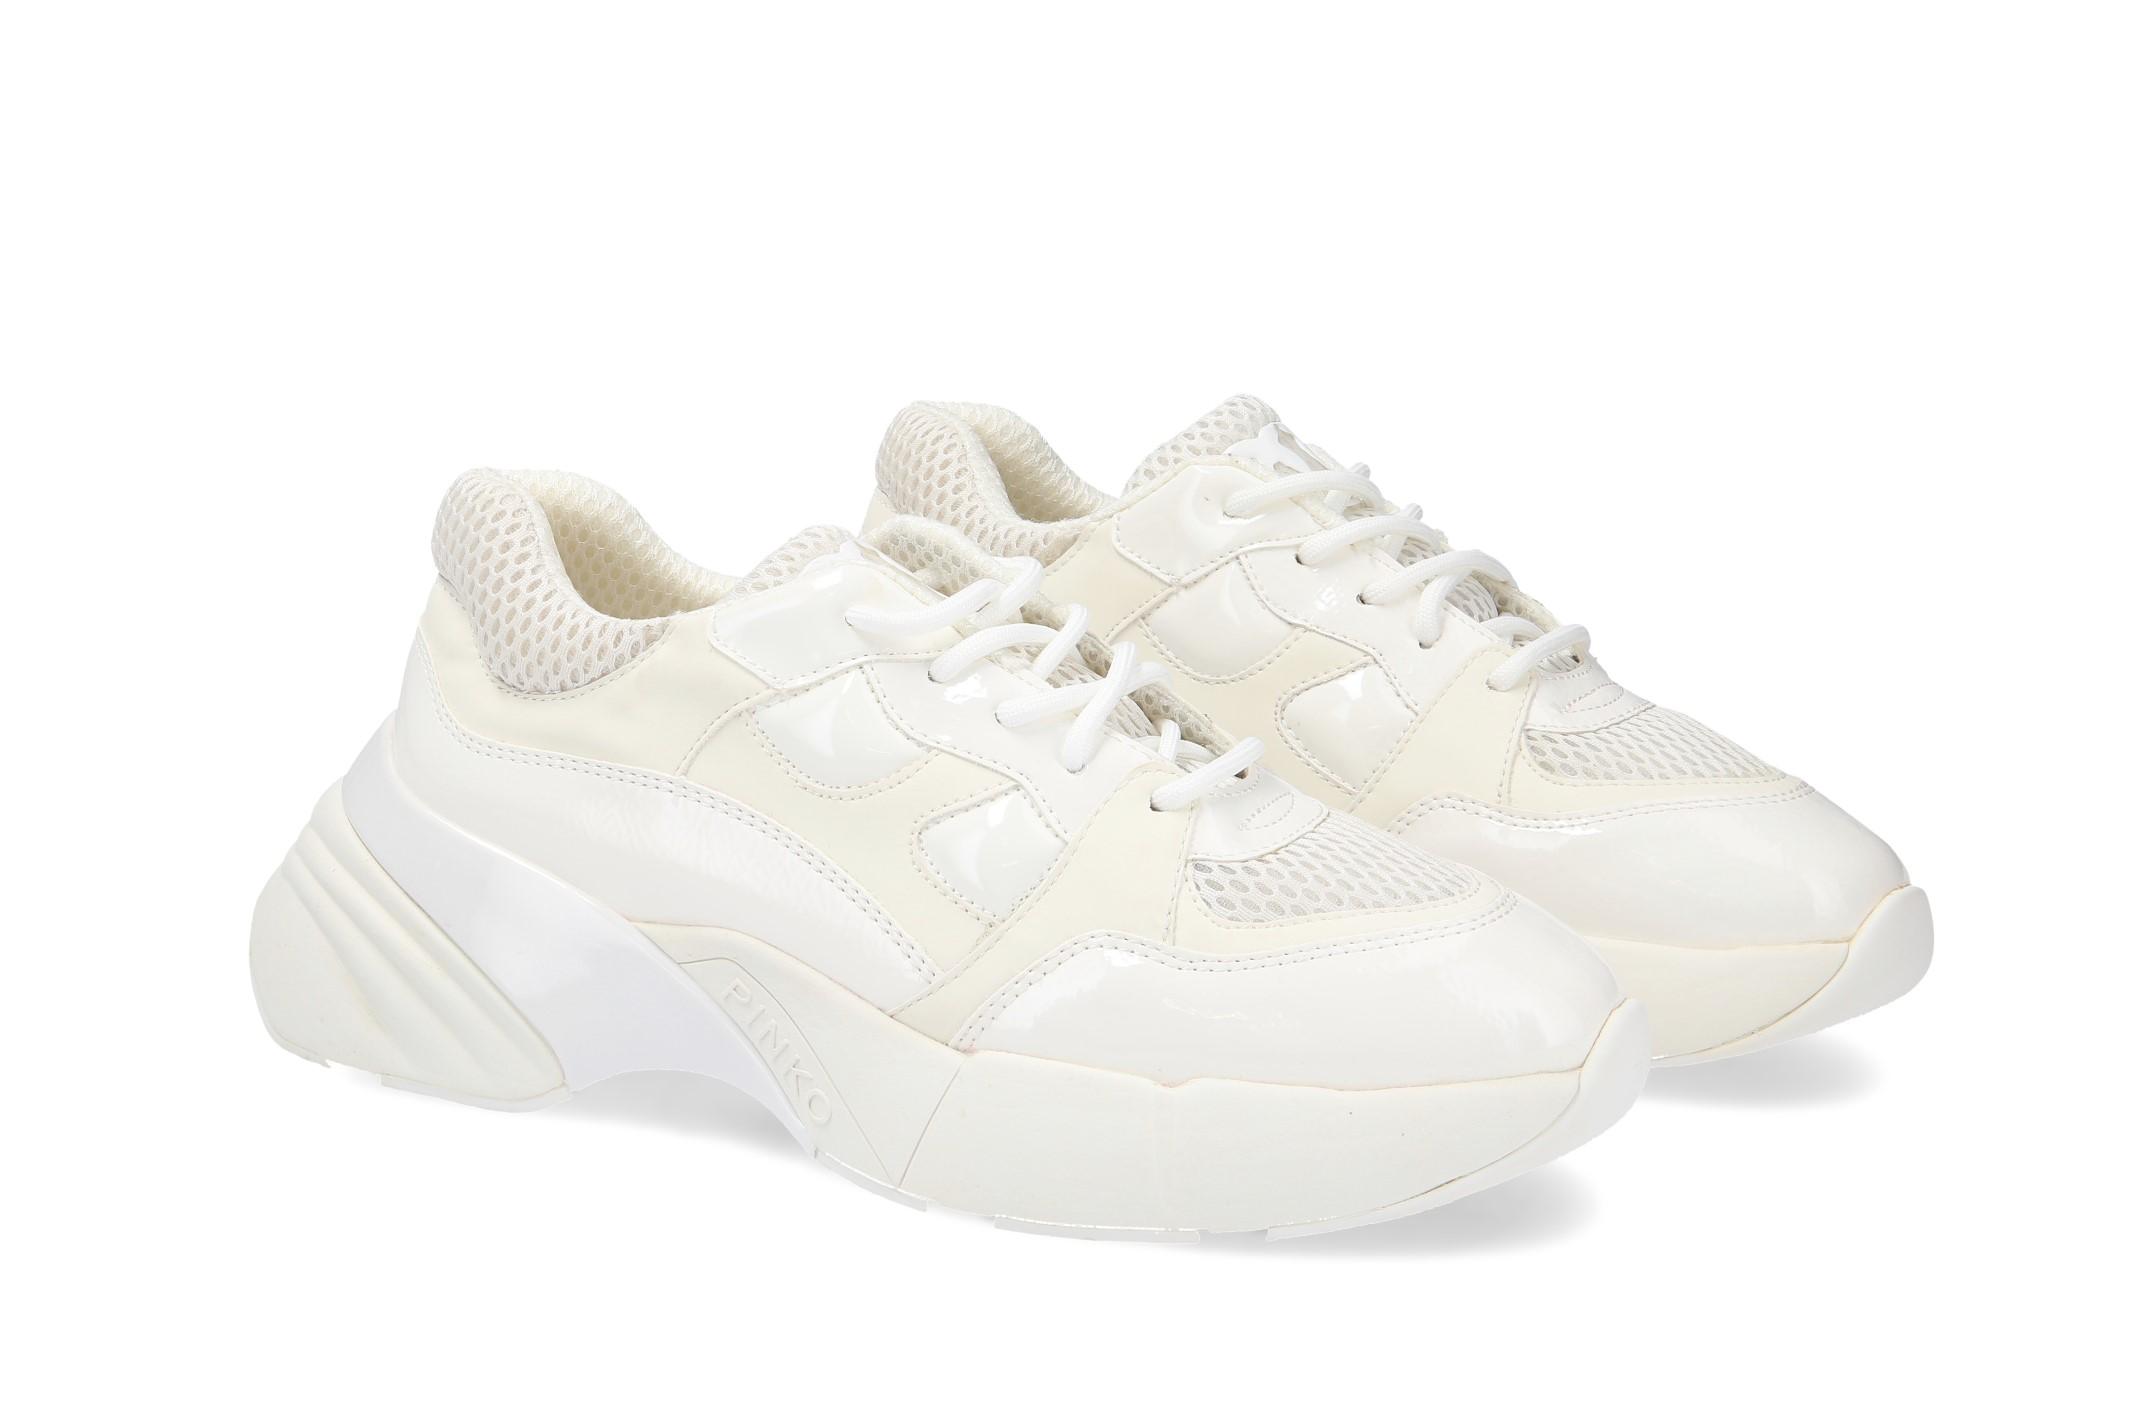 6804260f974 Sneakers RUBINO Pinko   White   Gomez.pl/en